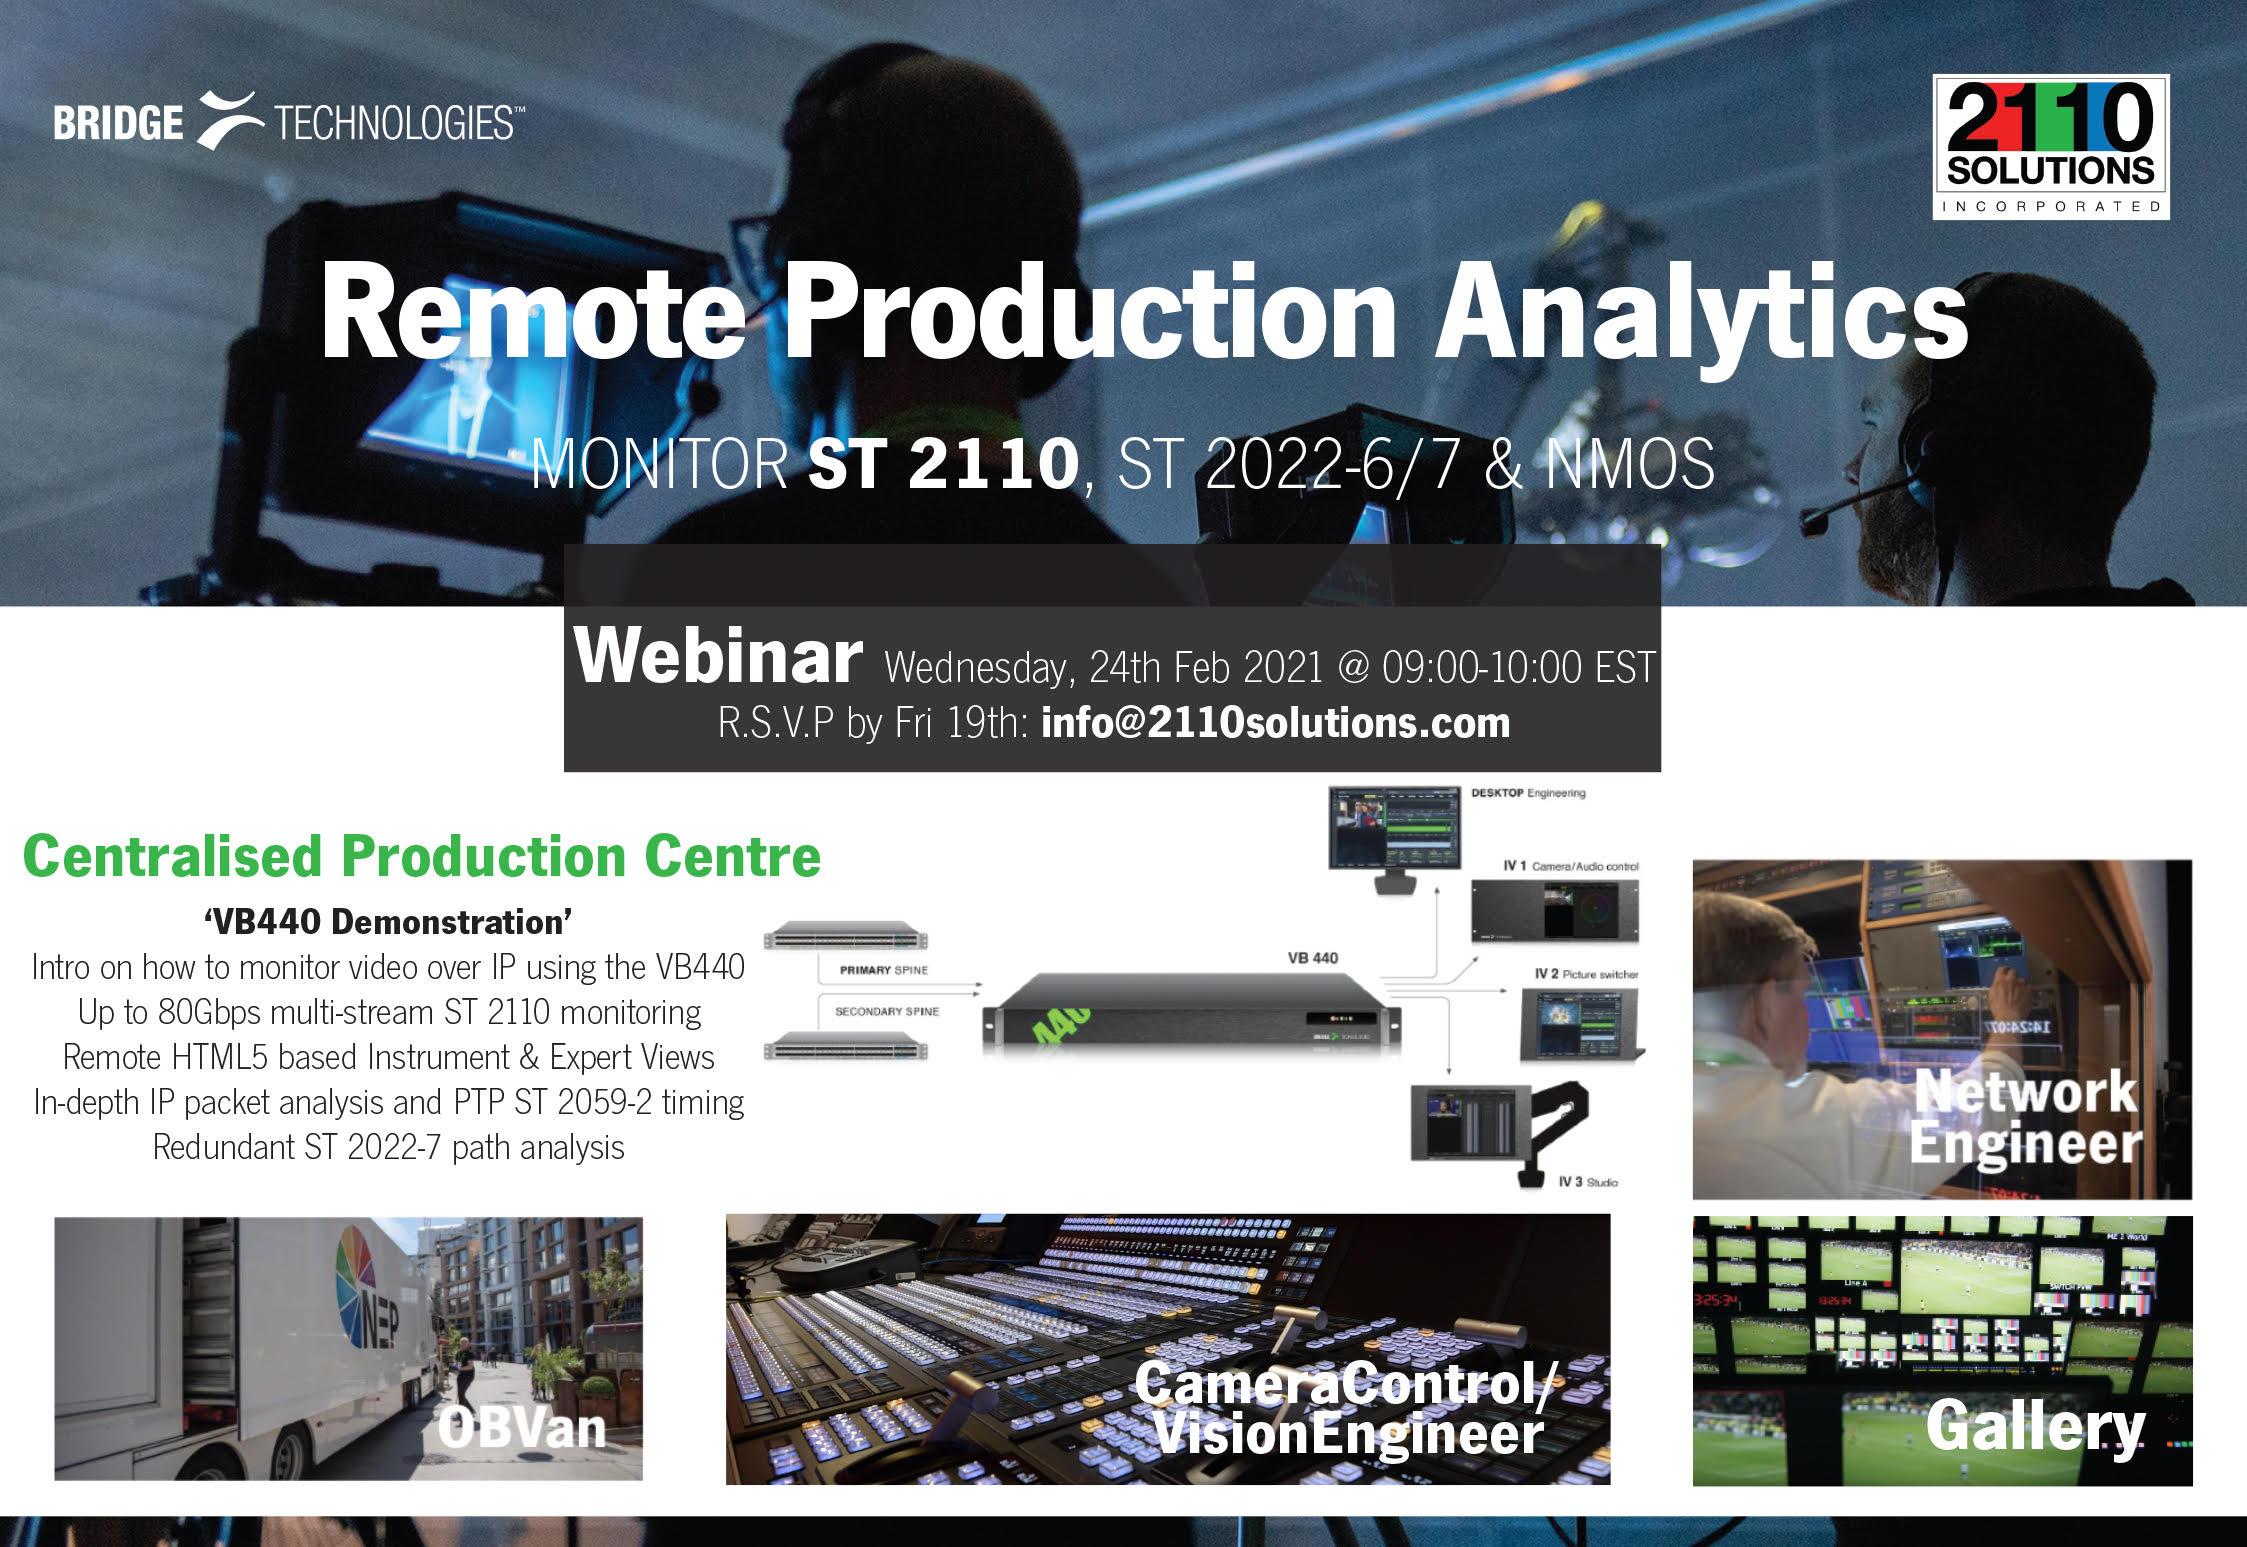 Remote Production Analytics Webinar